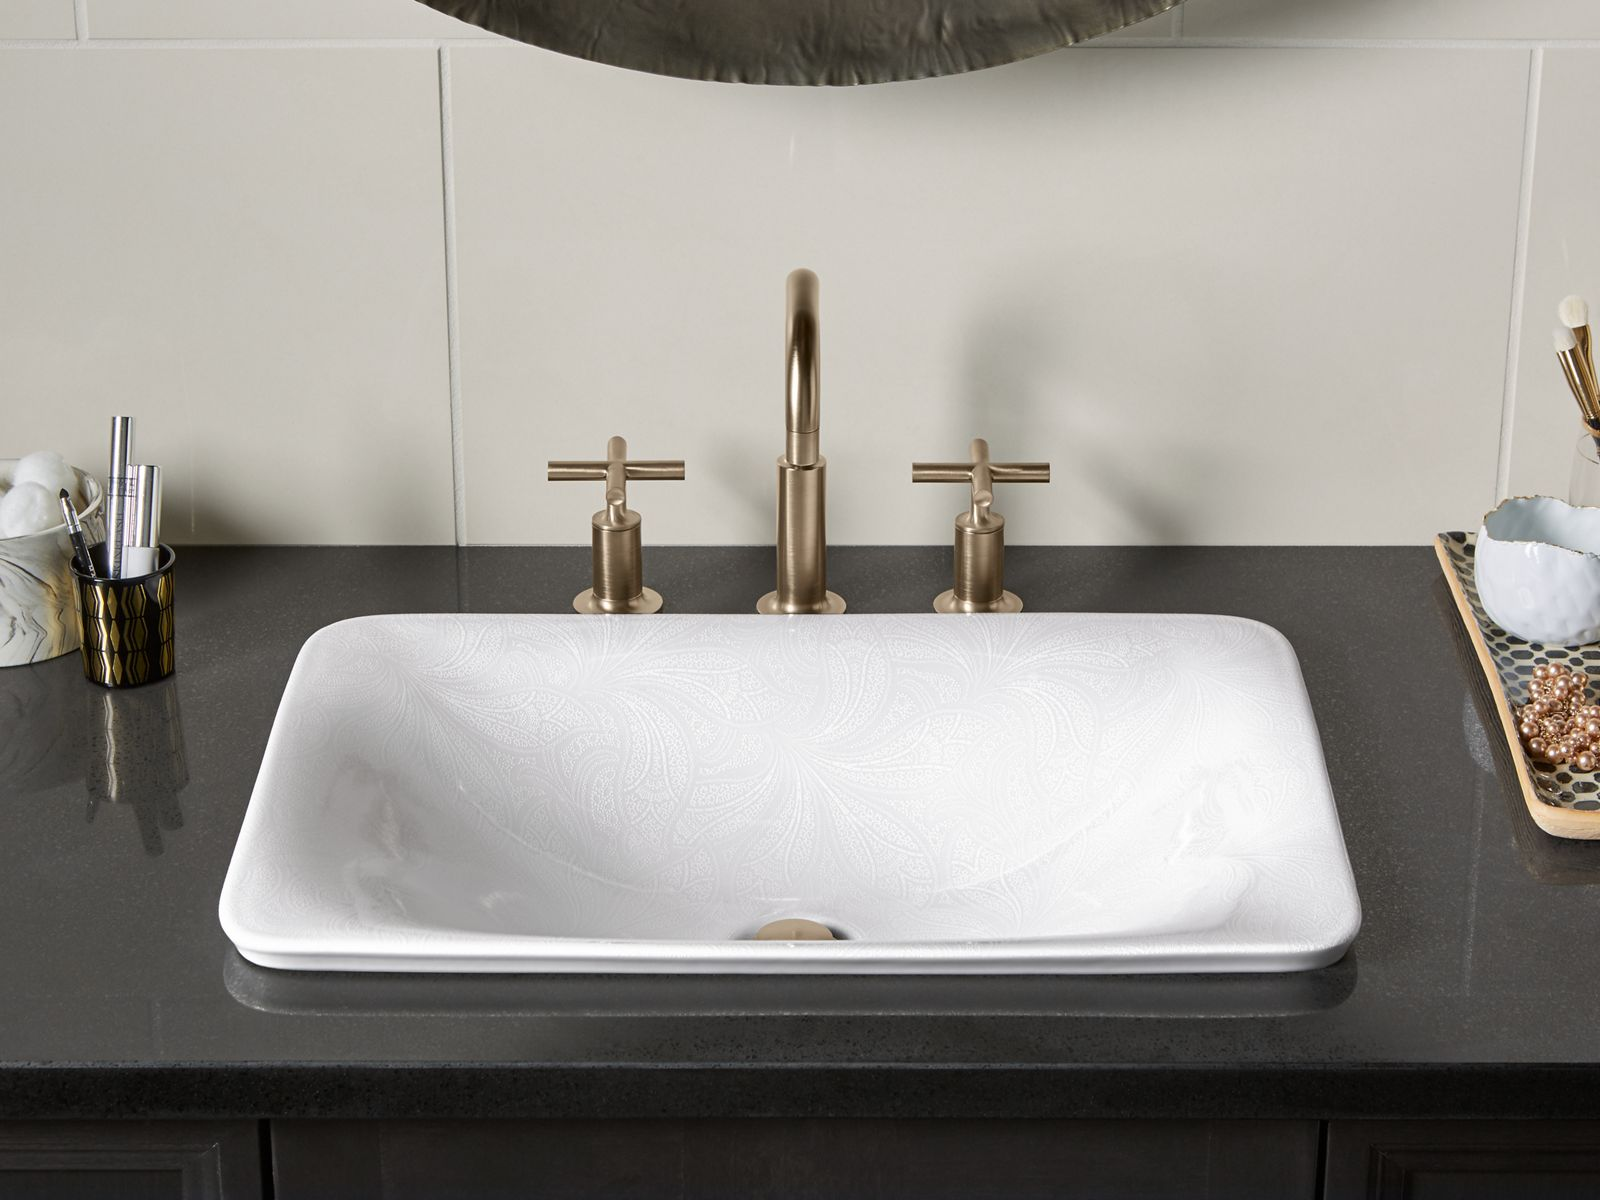 bathroom sink. USE AND FUNCTION Bathroom Sink